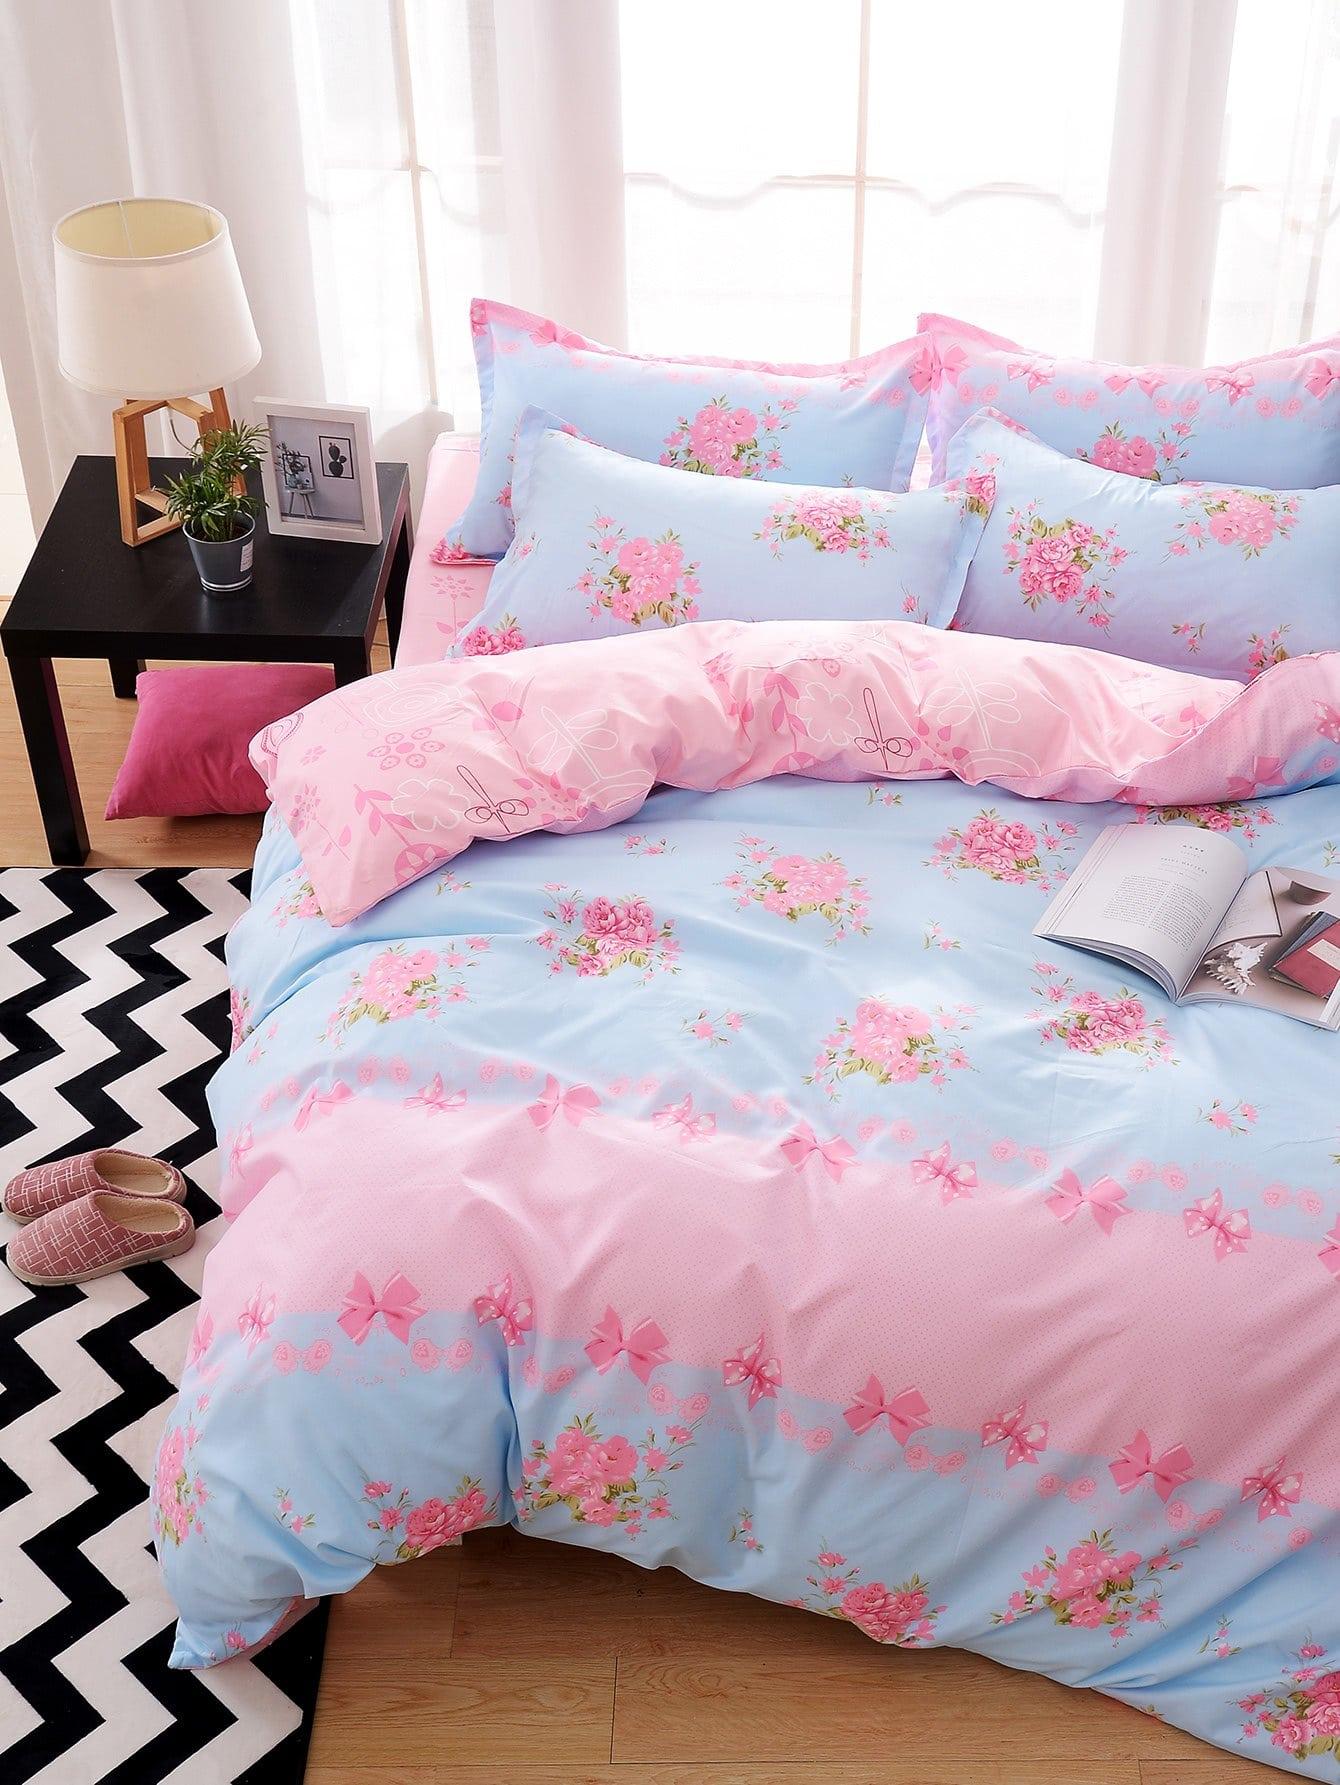 All Over Florals Duvet Cover Set all over florals dip hem shirt